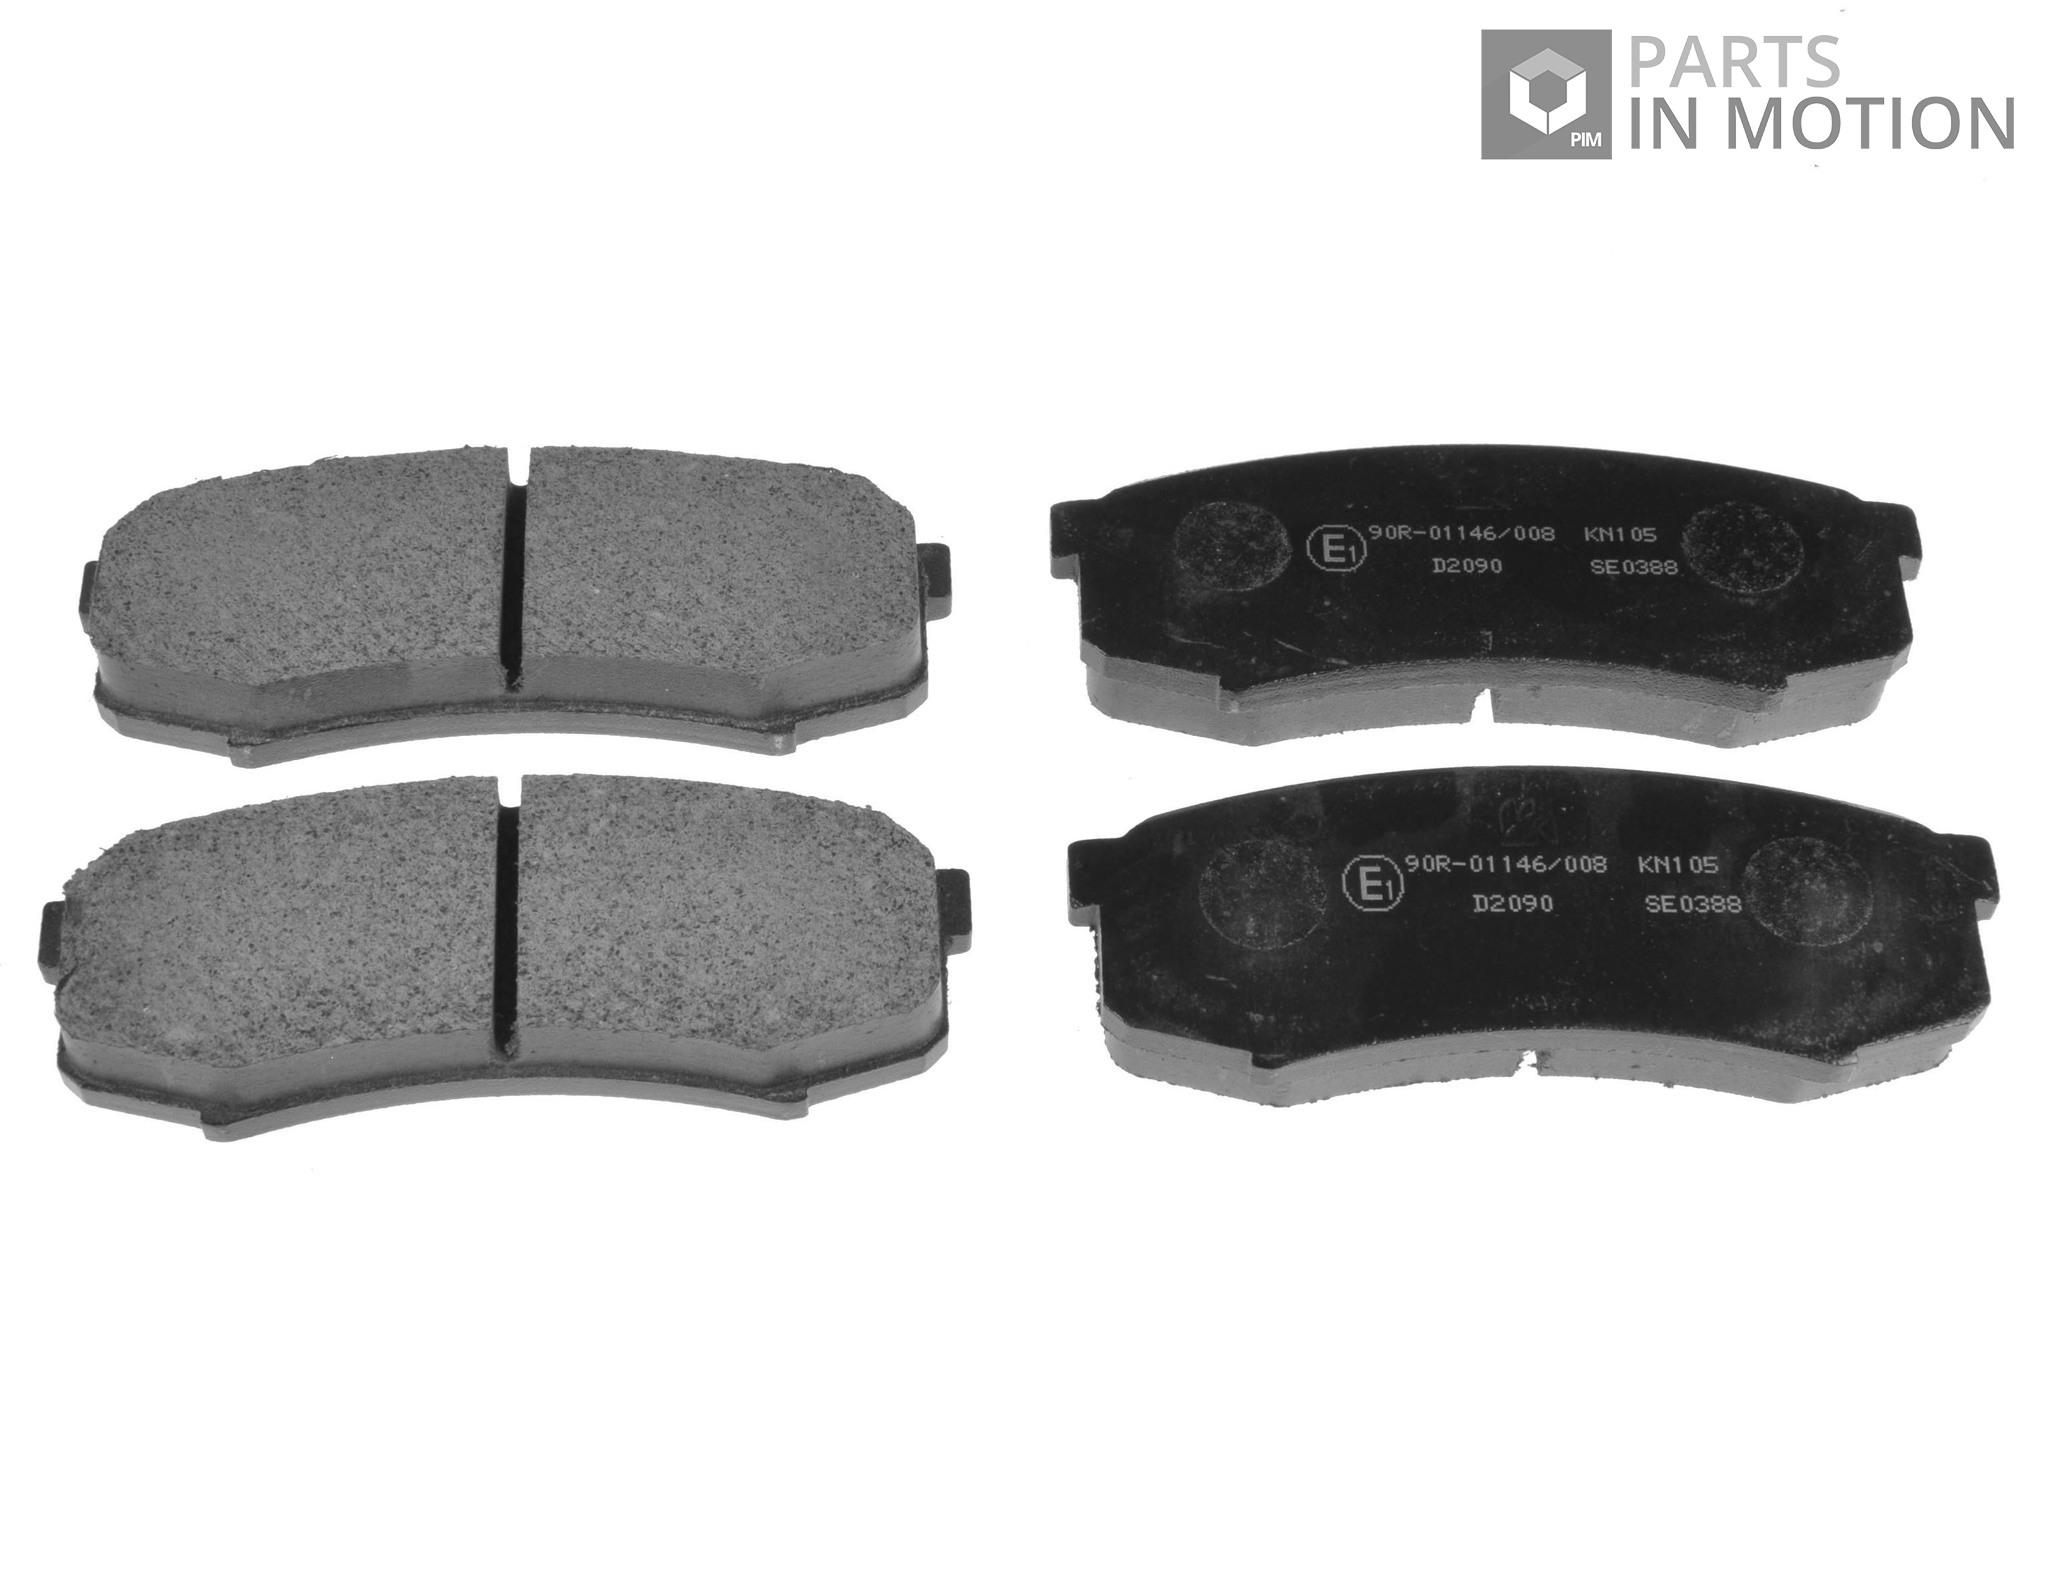 MINTEX REAR BRAKE PADS MDB1696 FOR MITSUBISHI SHOGUN 3.2 TD V98 LWB 2006